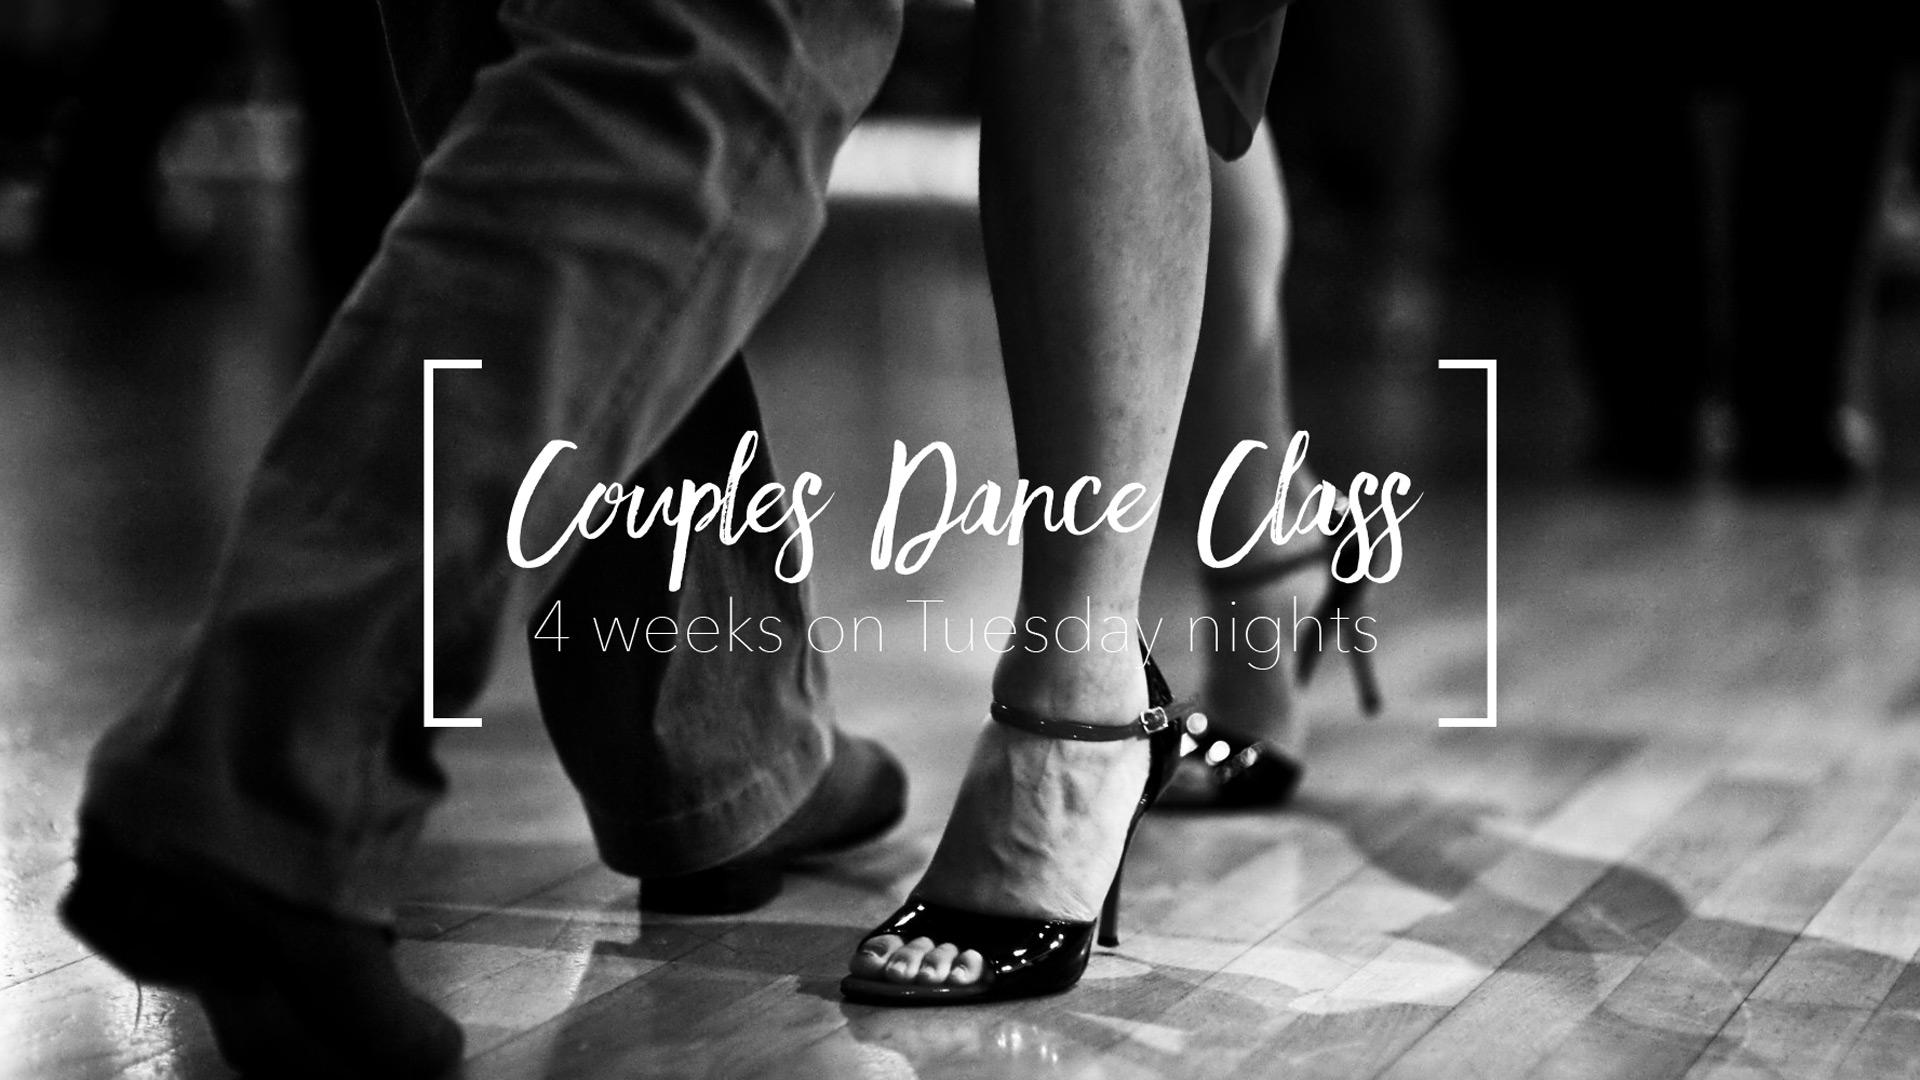 Couples dance class